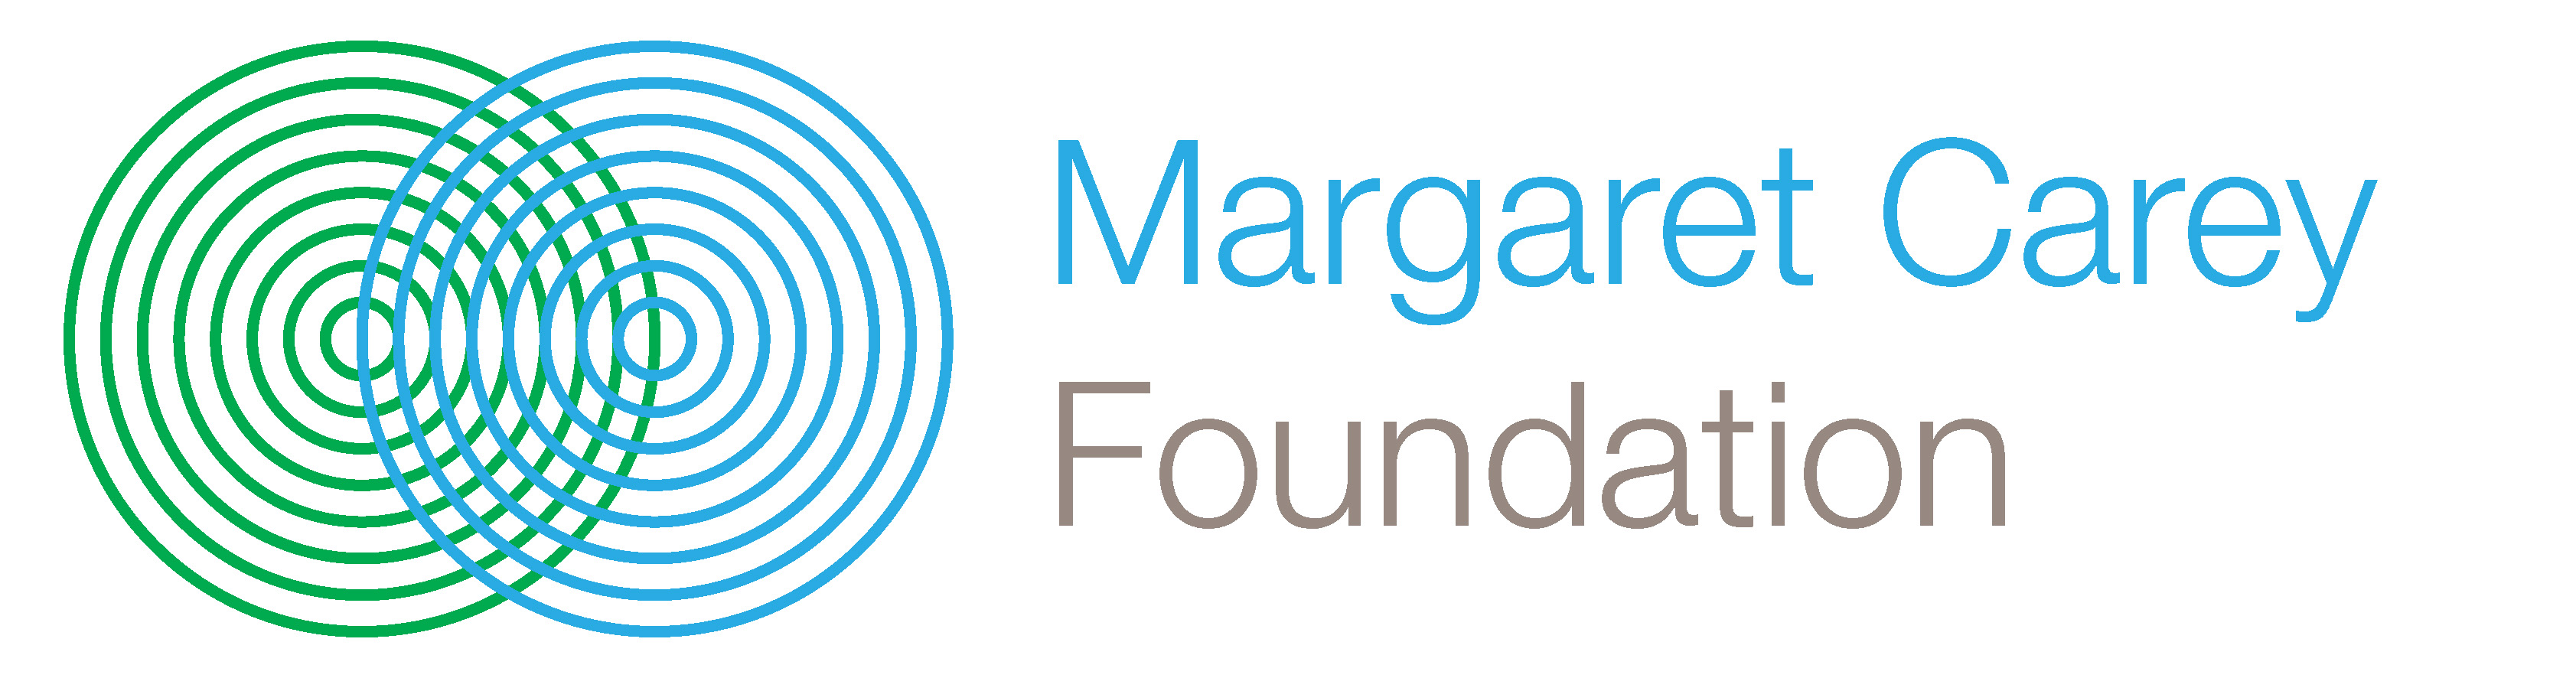 Margaret Carey Foundation